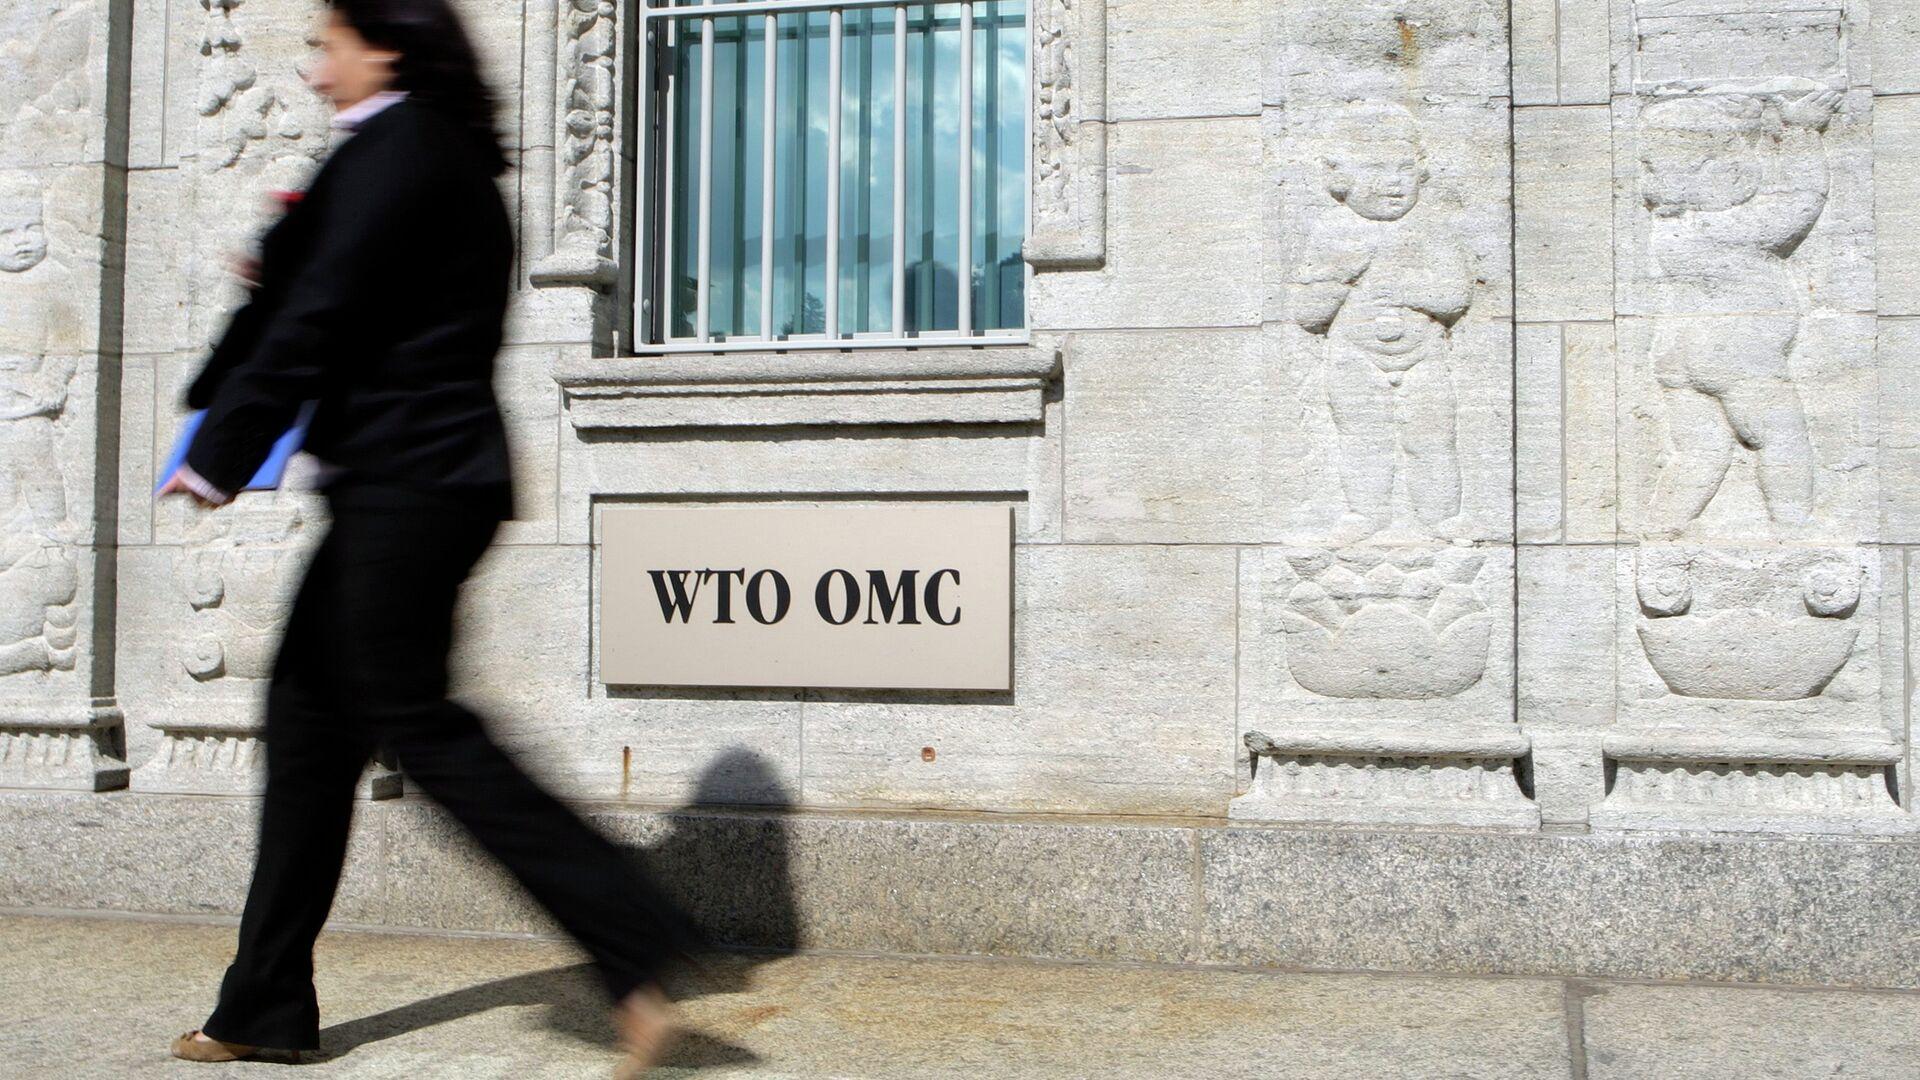 A woman walks near the WTO building in Geneva - 1920, 10/27/2021